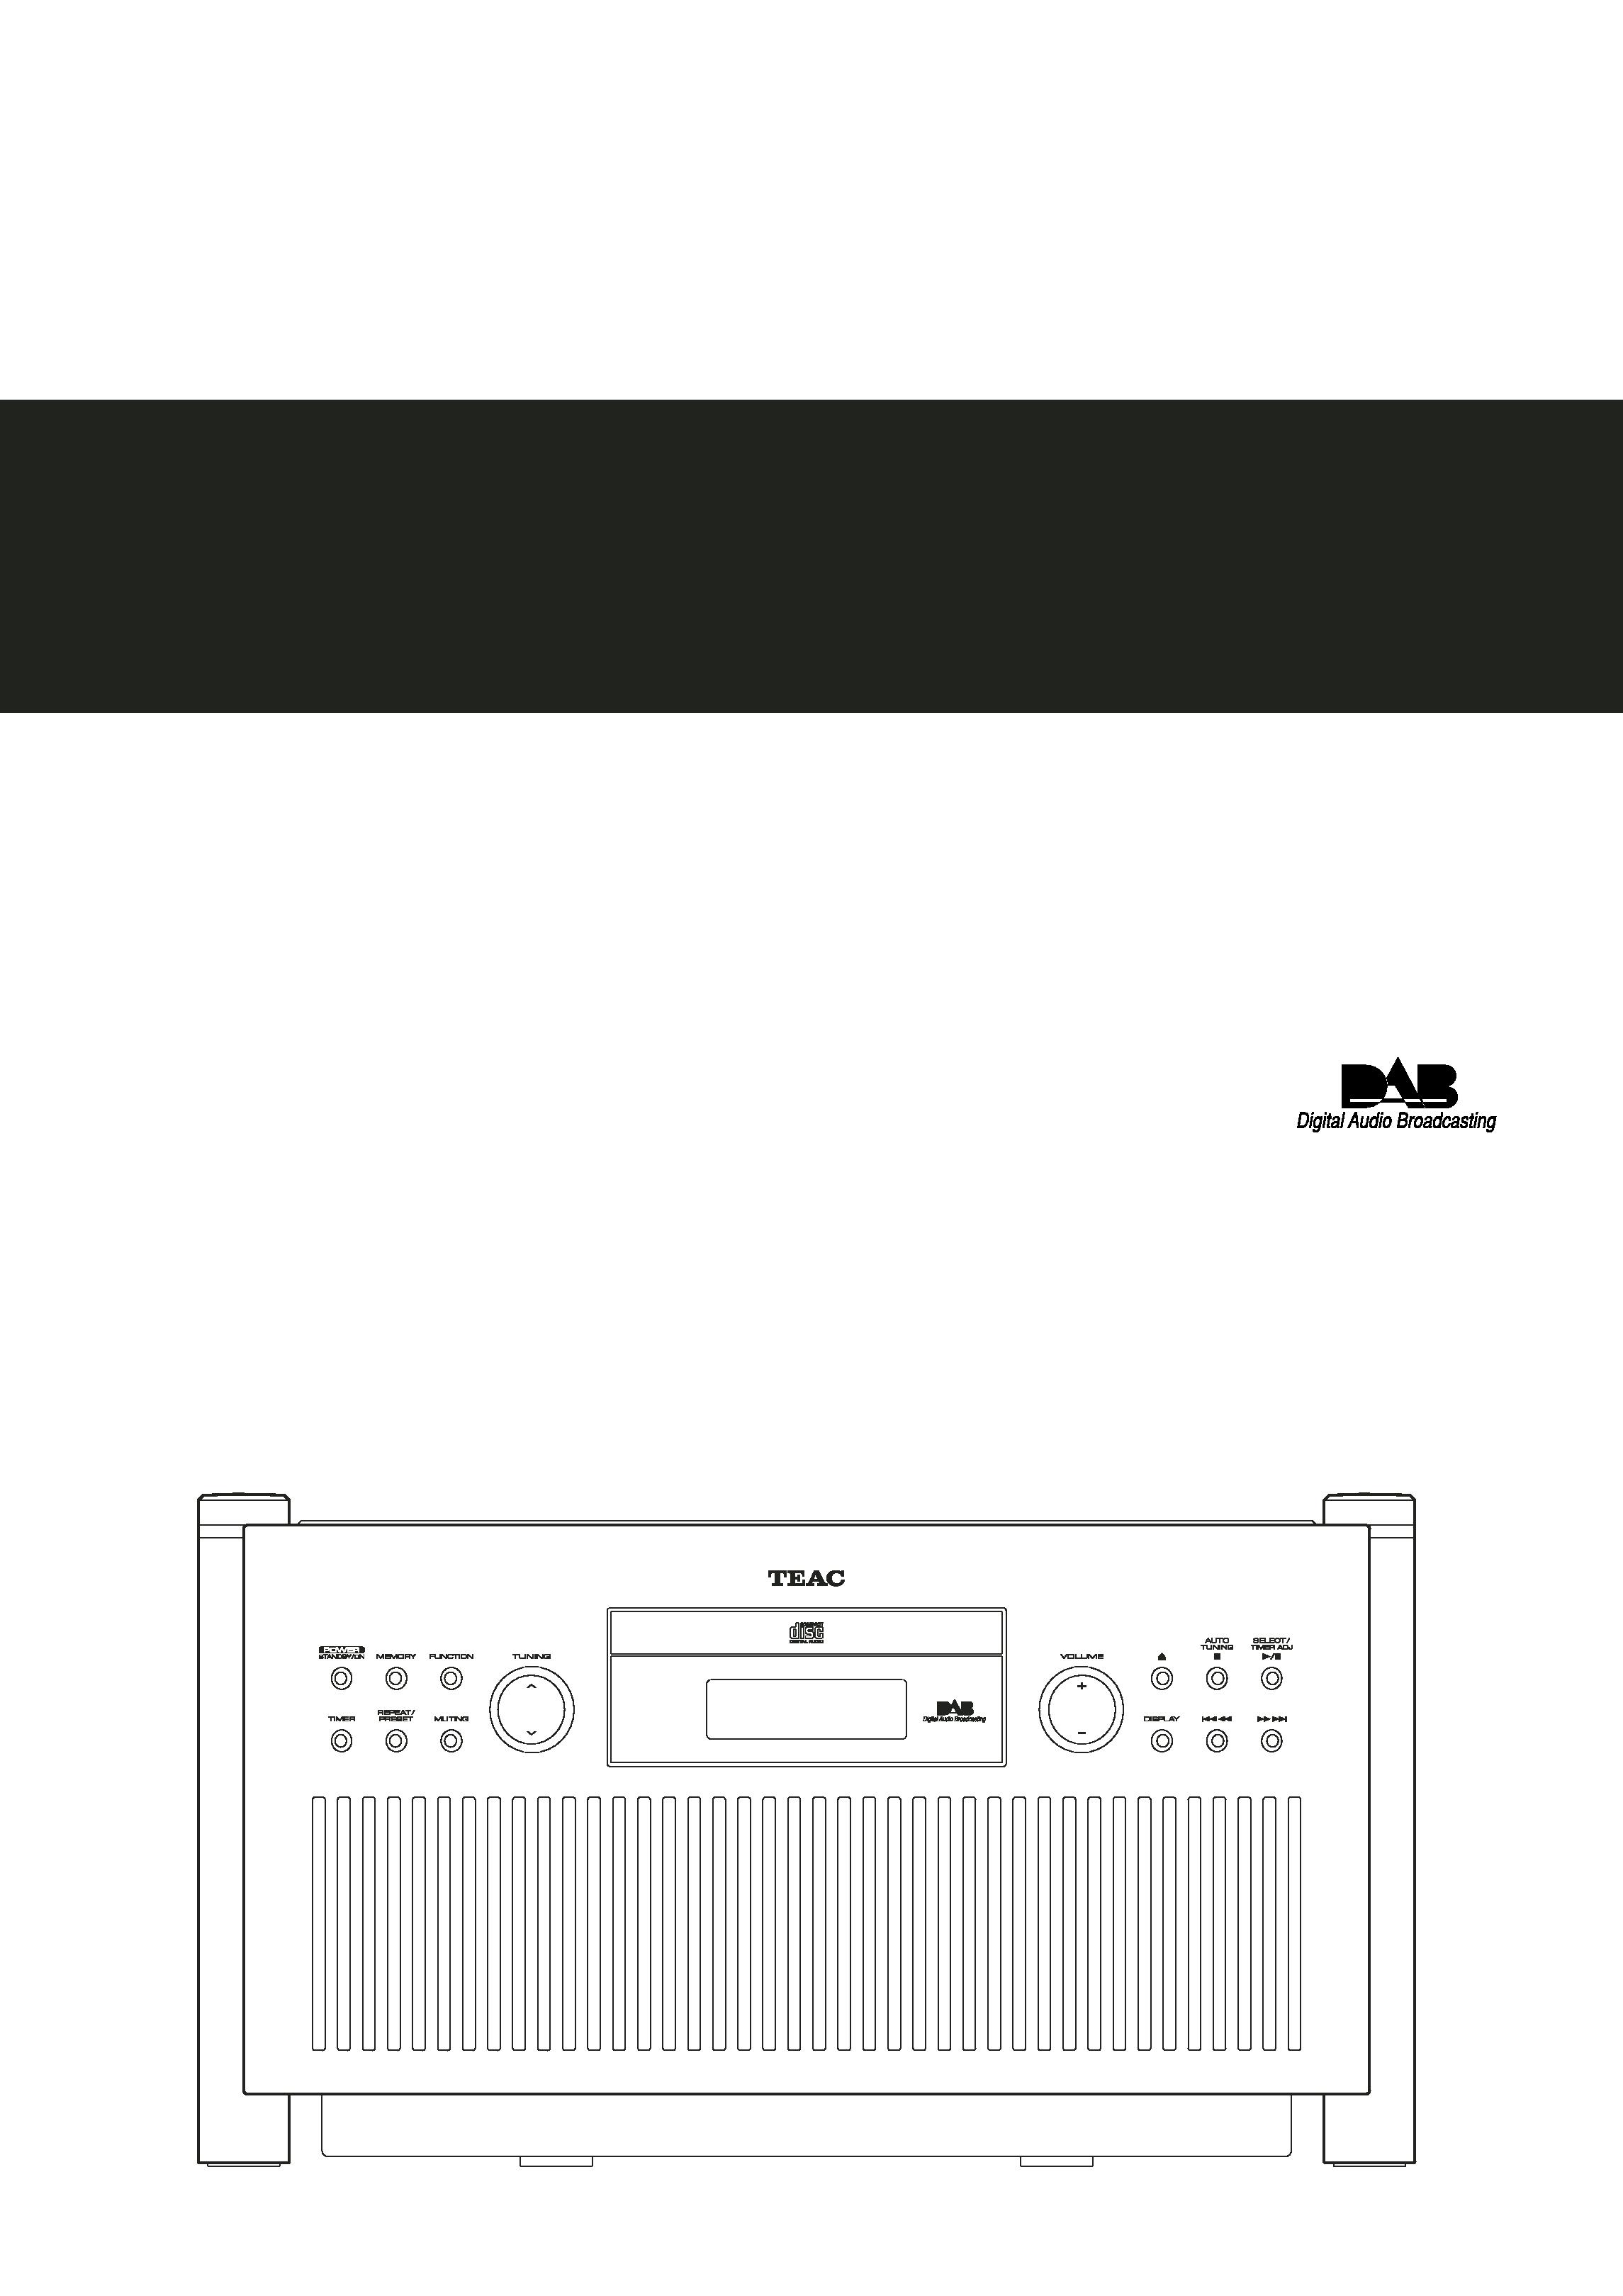 Cd ресиверы pioneer nc-50dab-b